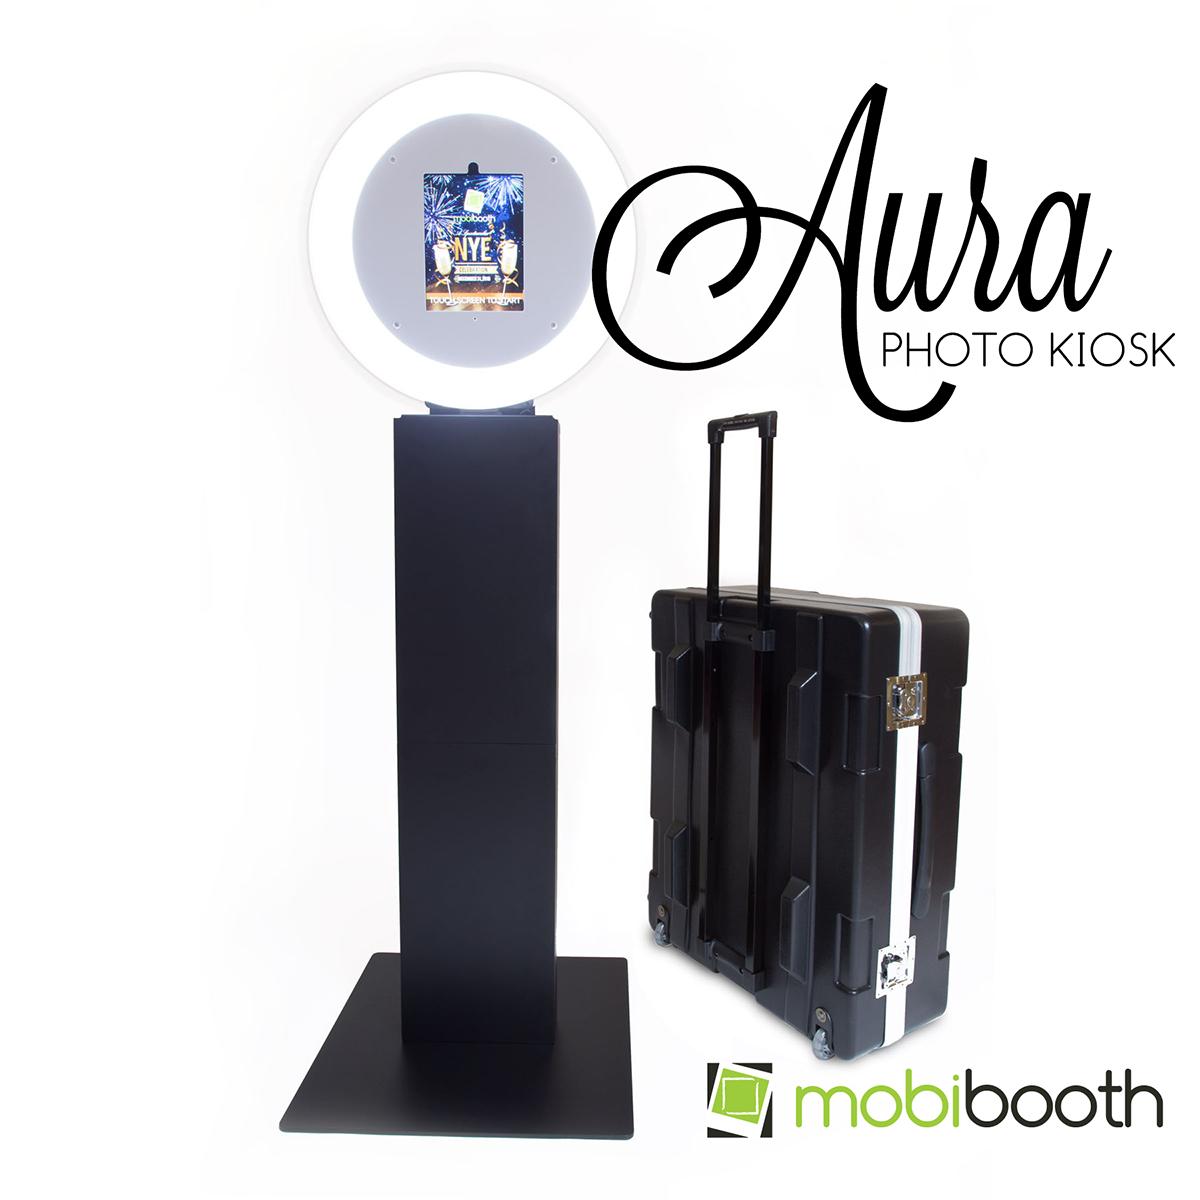 Aura photo kiosk